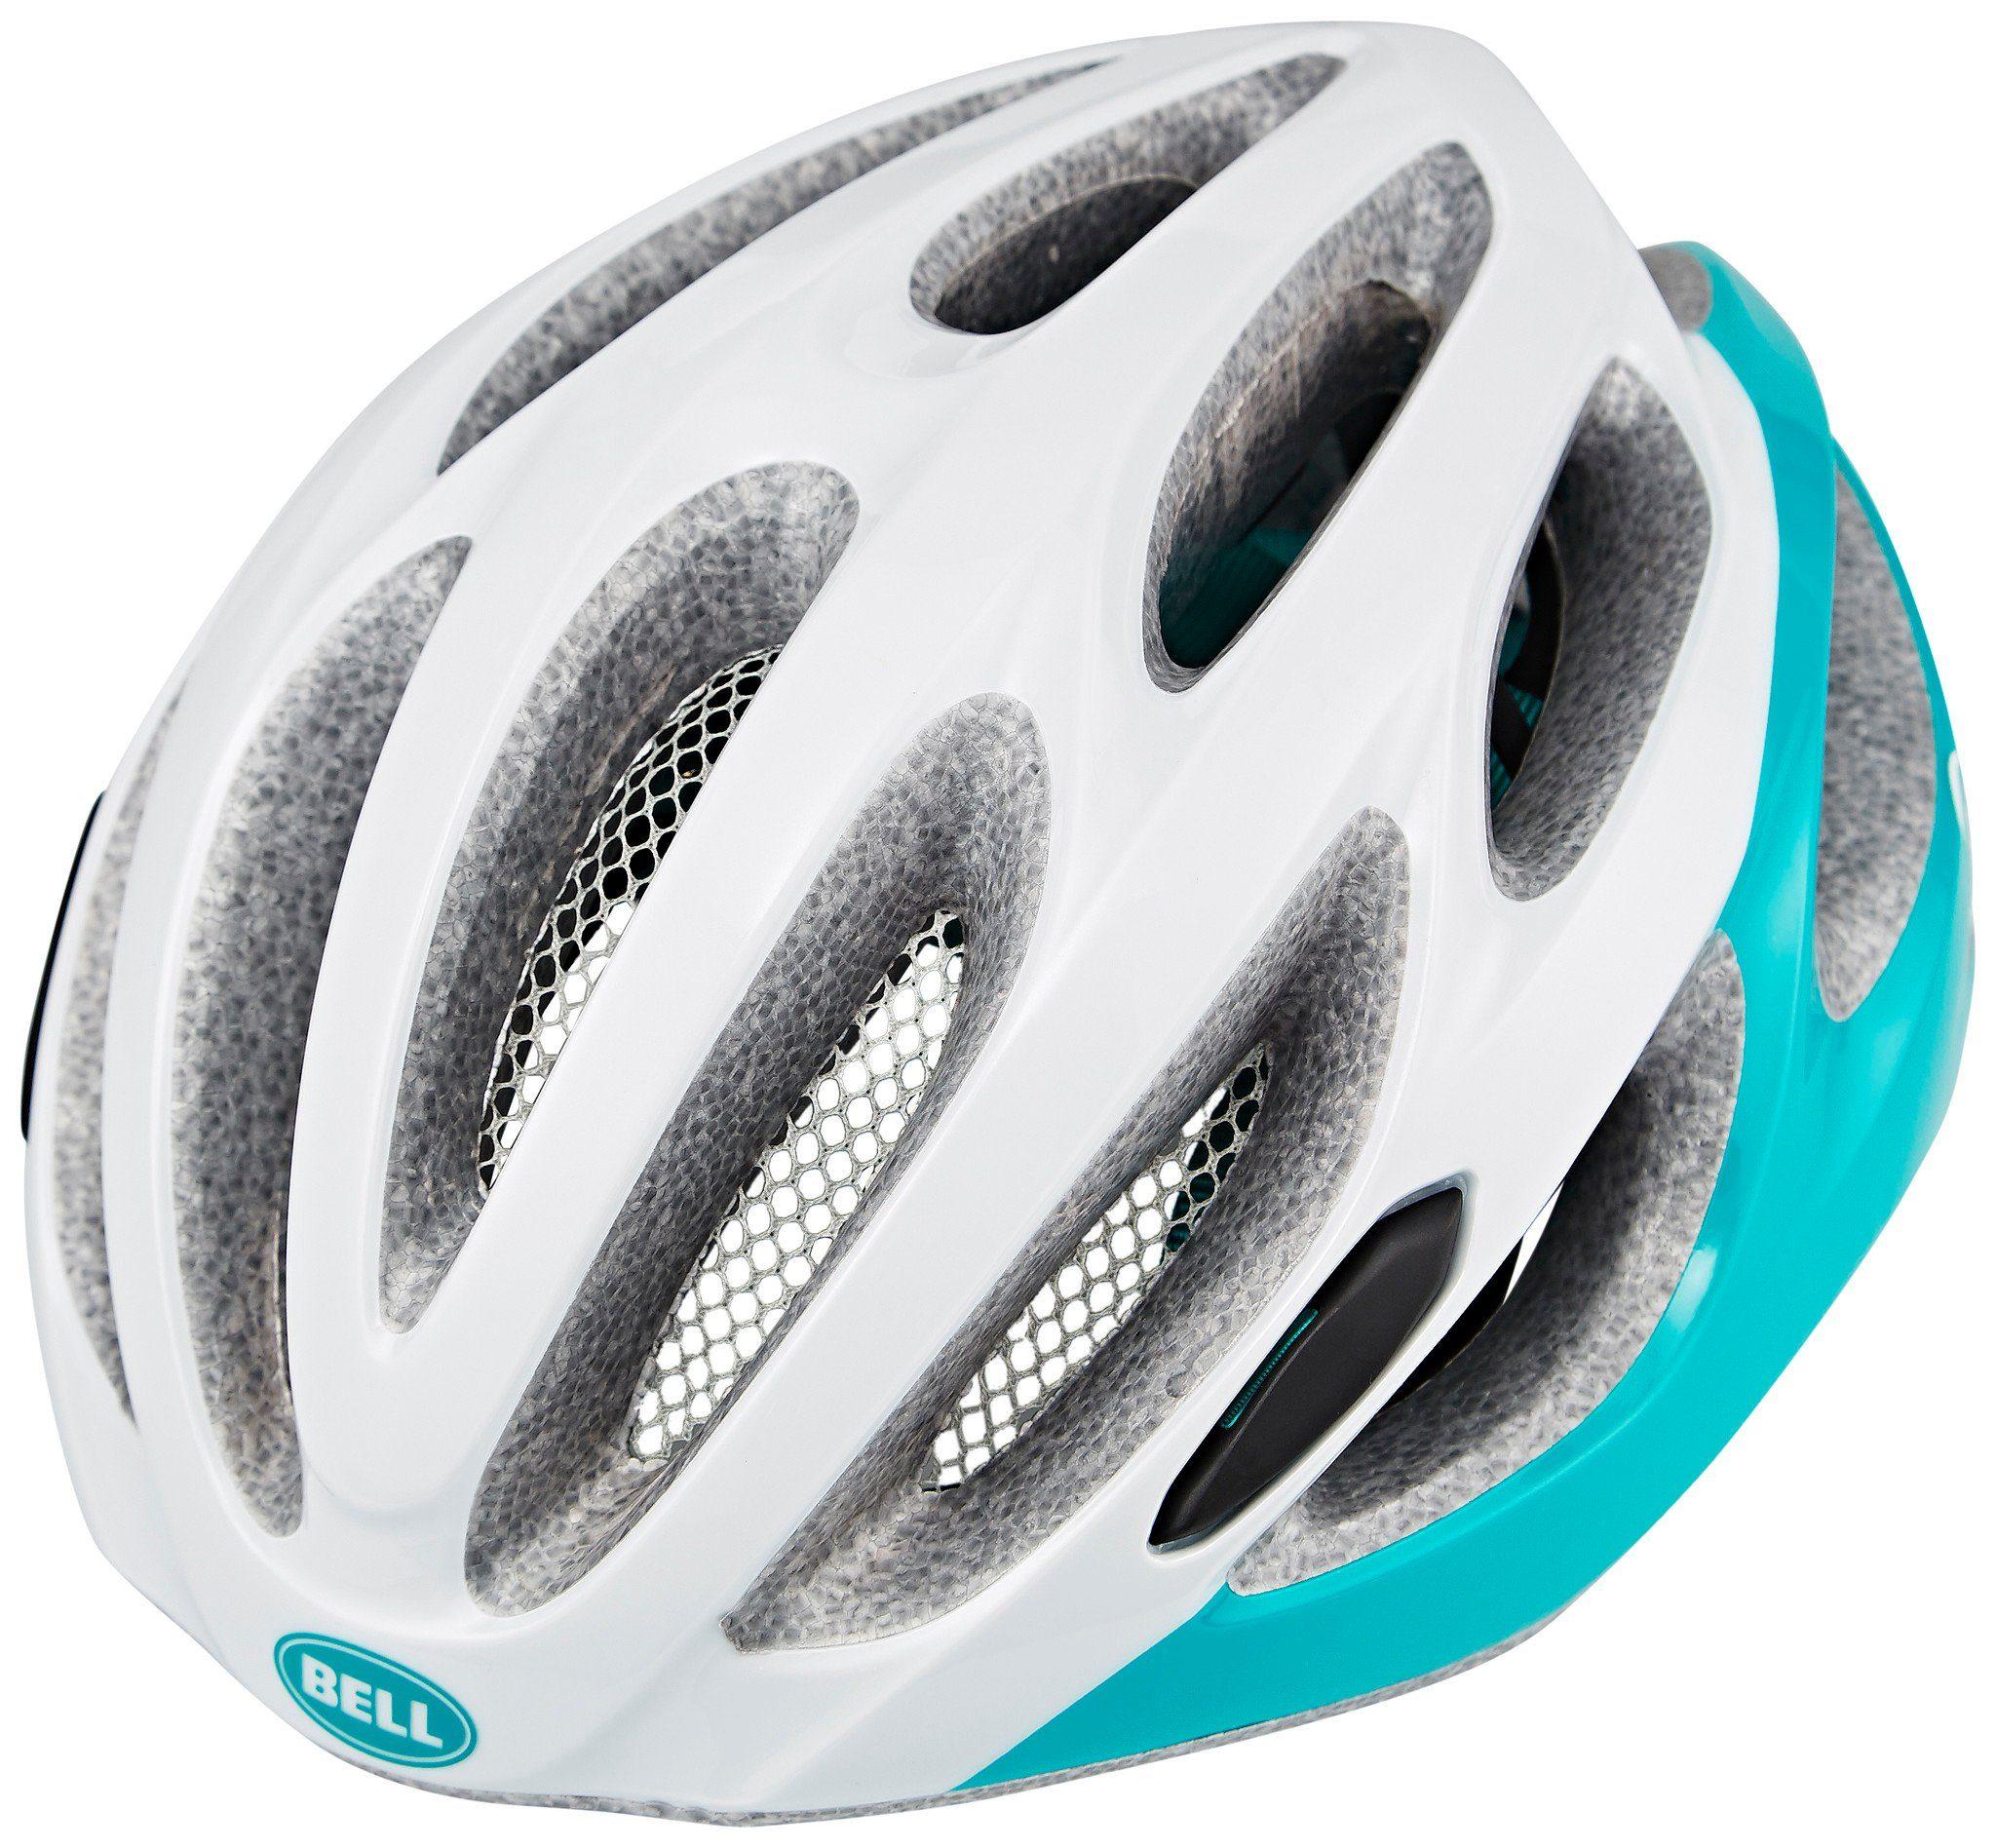 Bell Fahrradhelm »Tempo Joy Helmet«